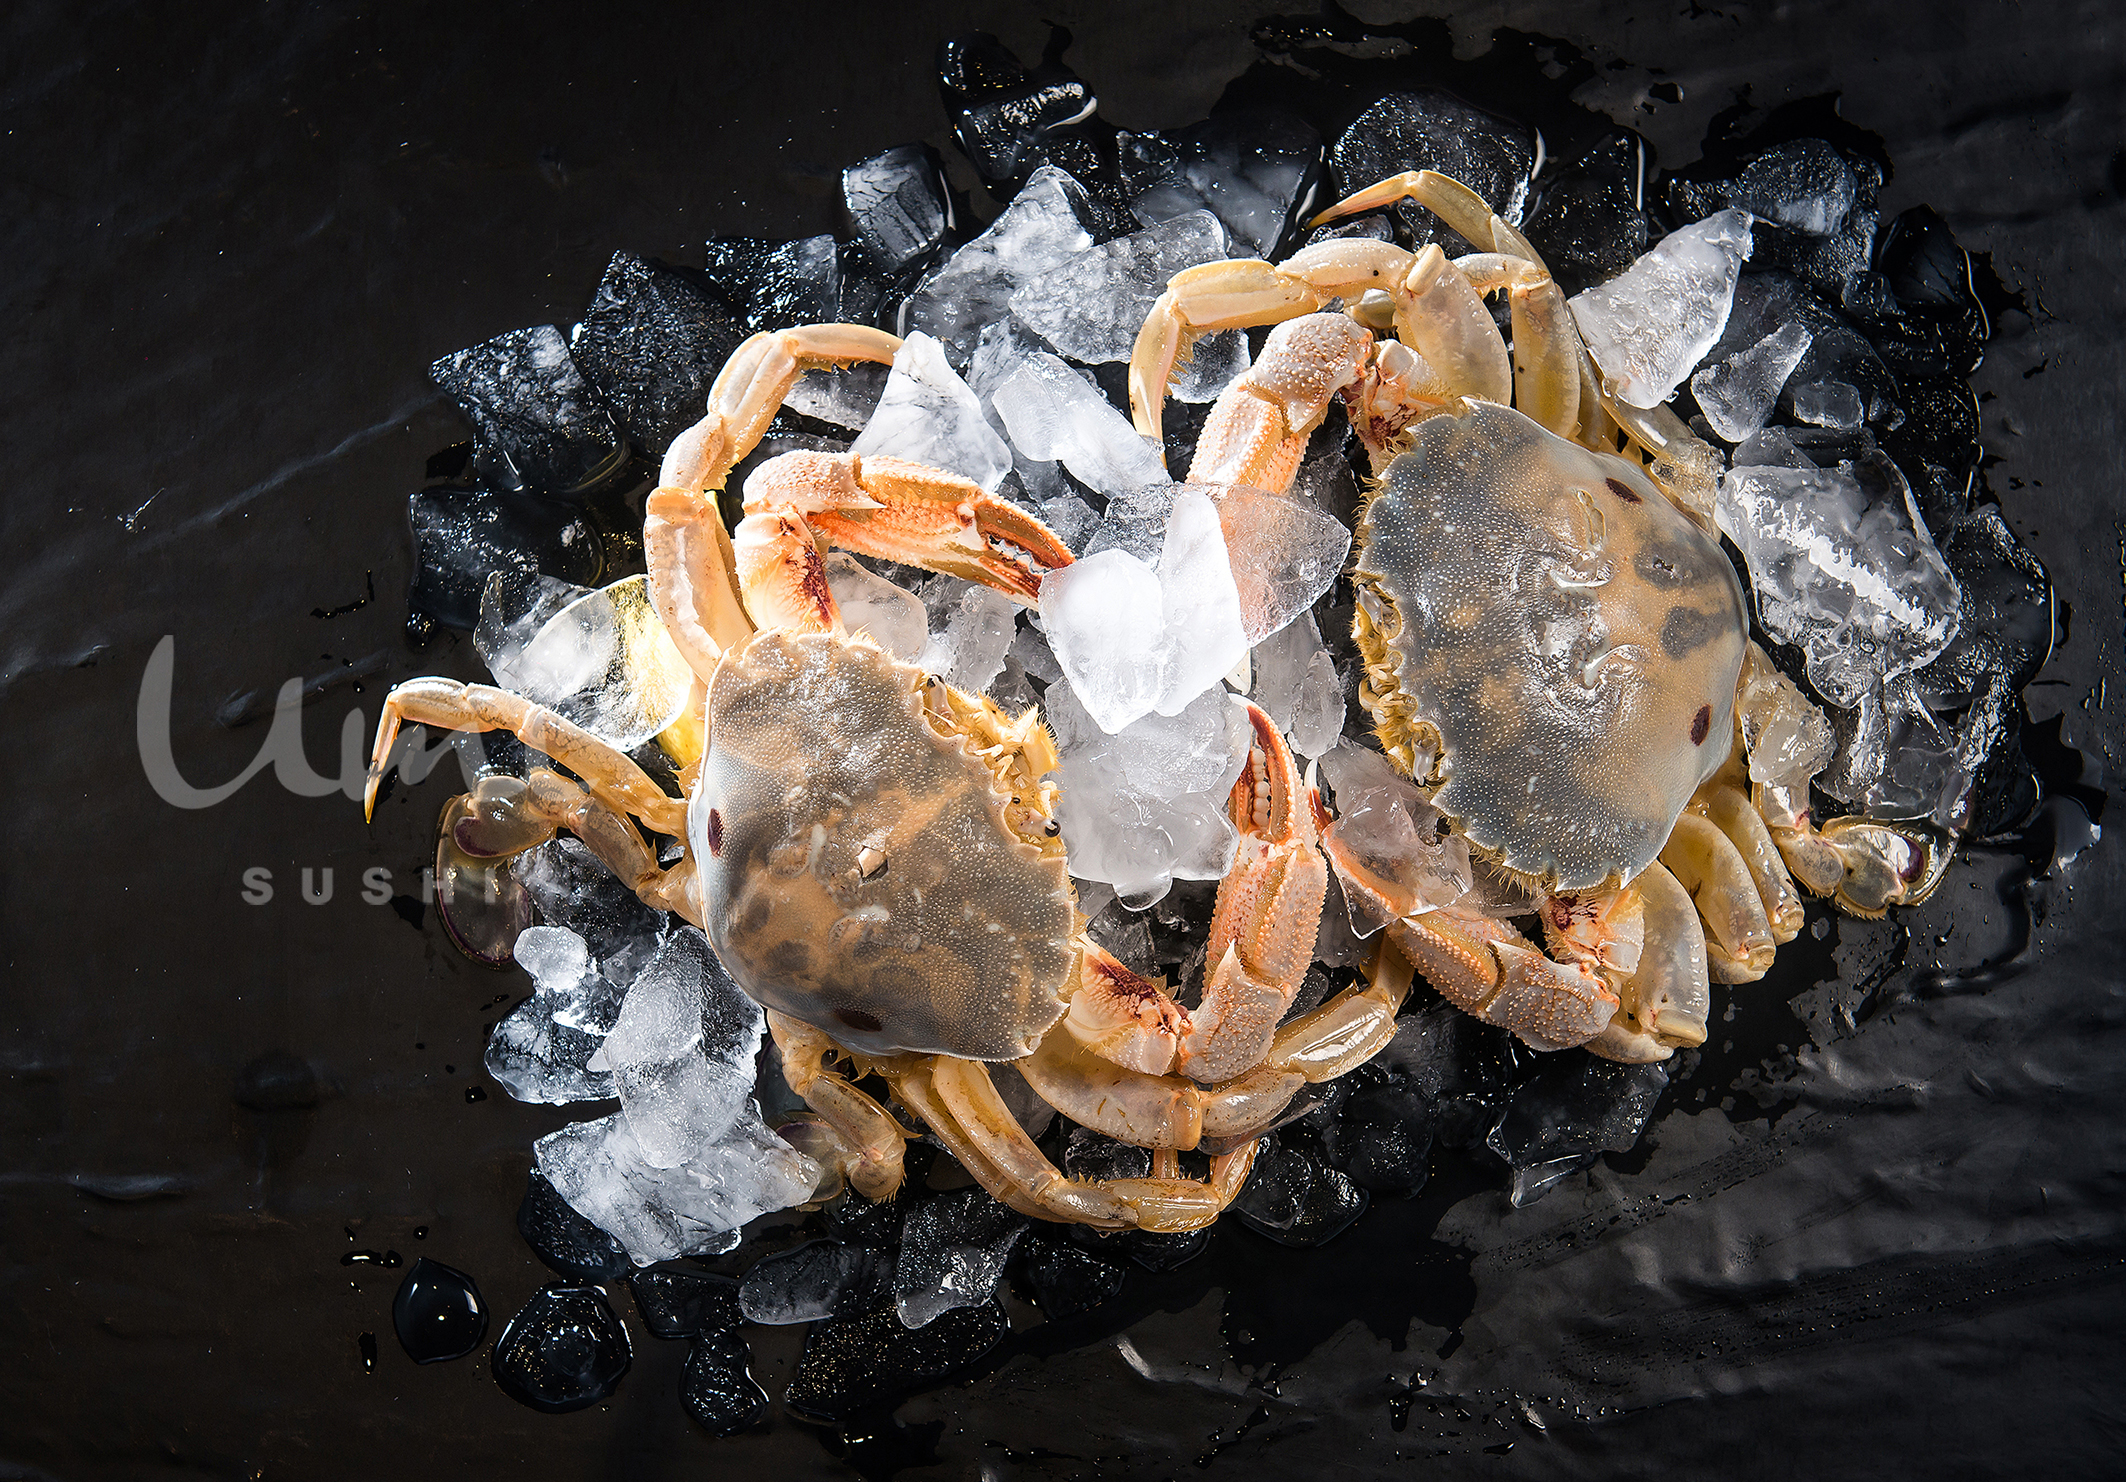 Live Baby Crab